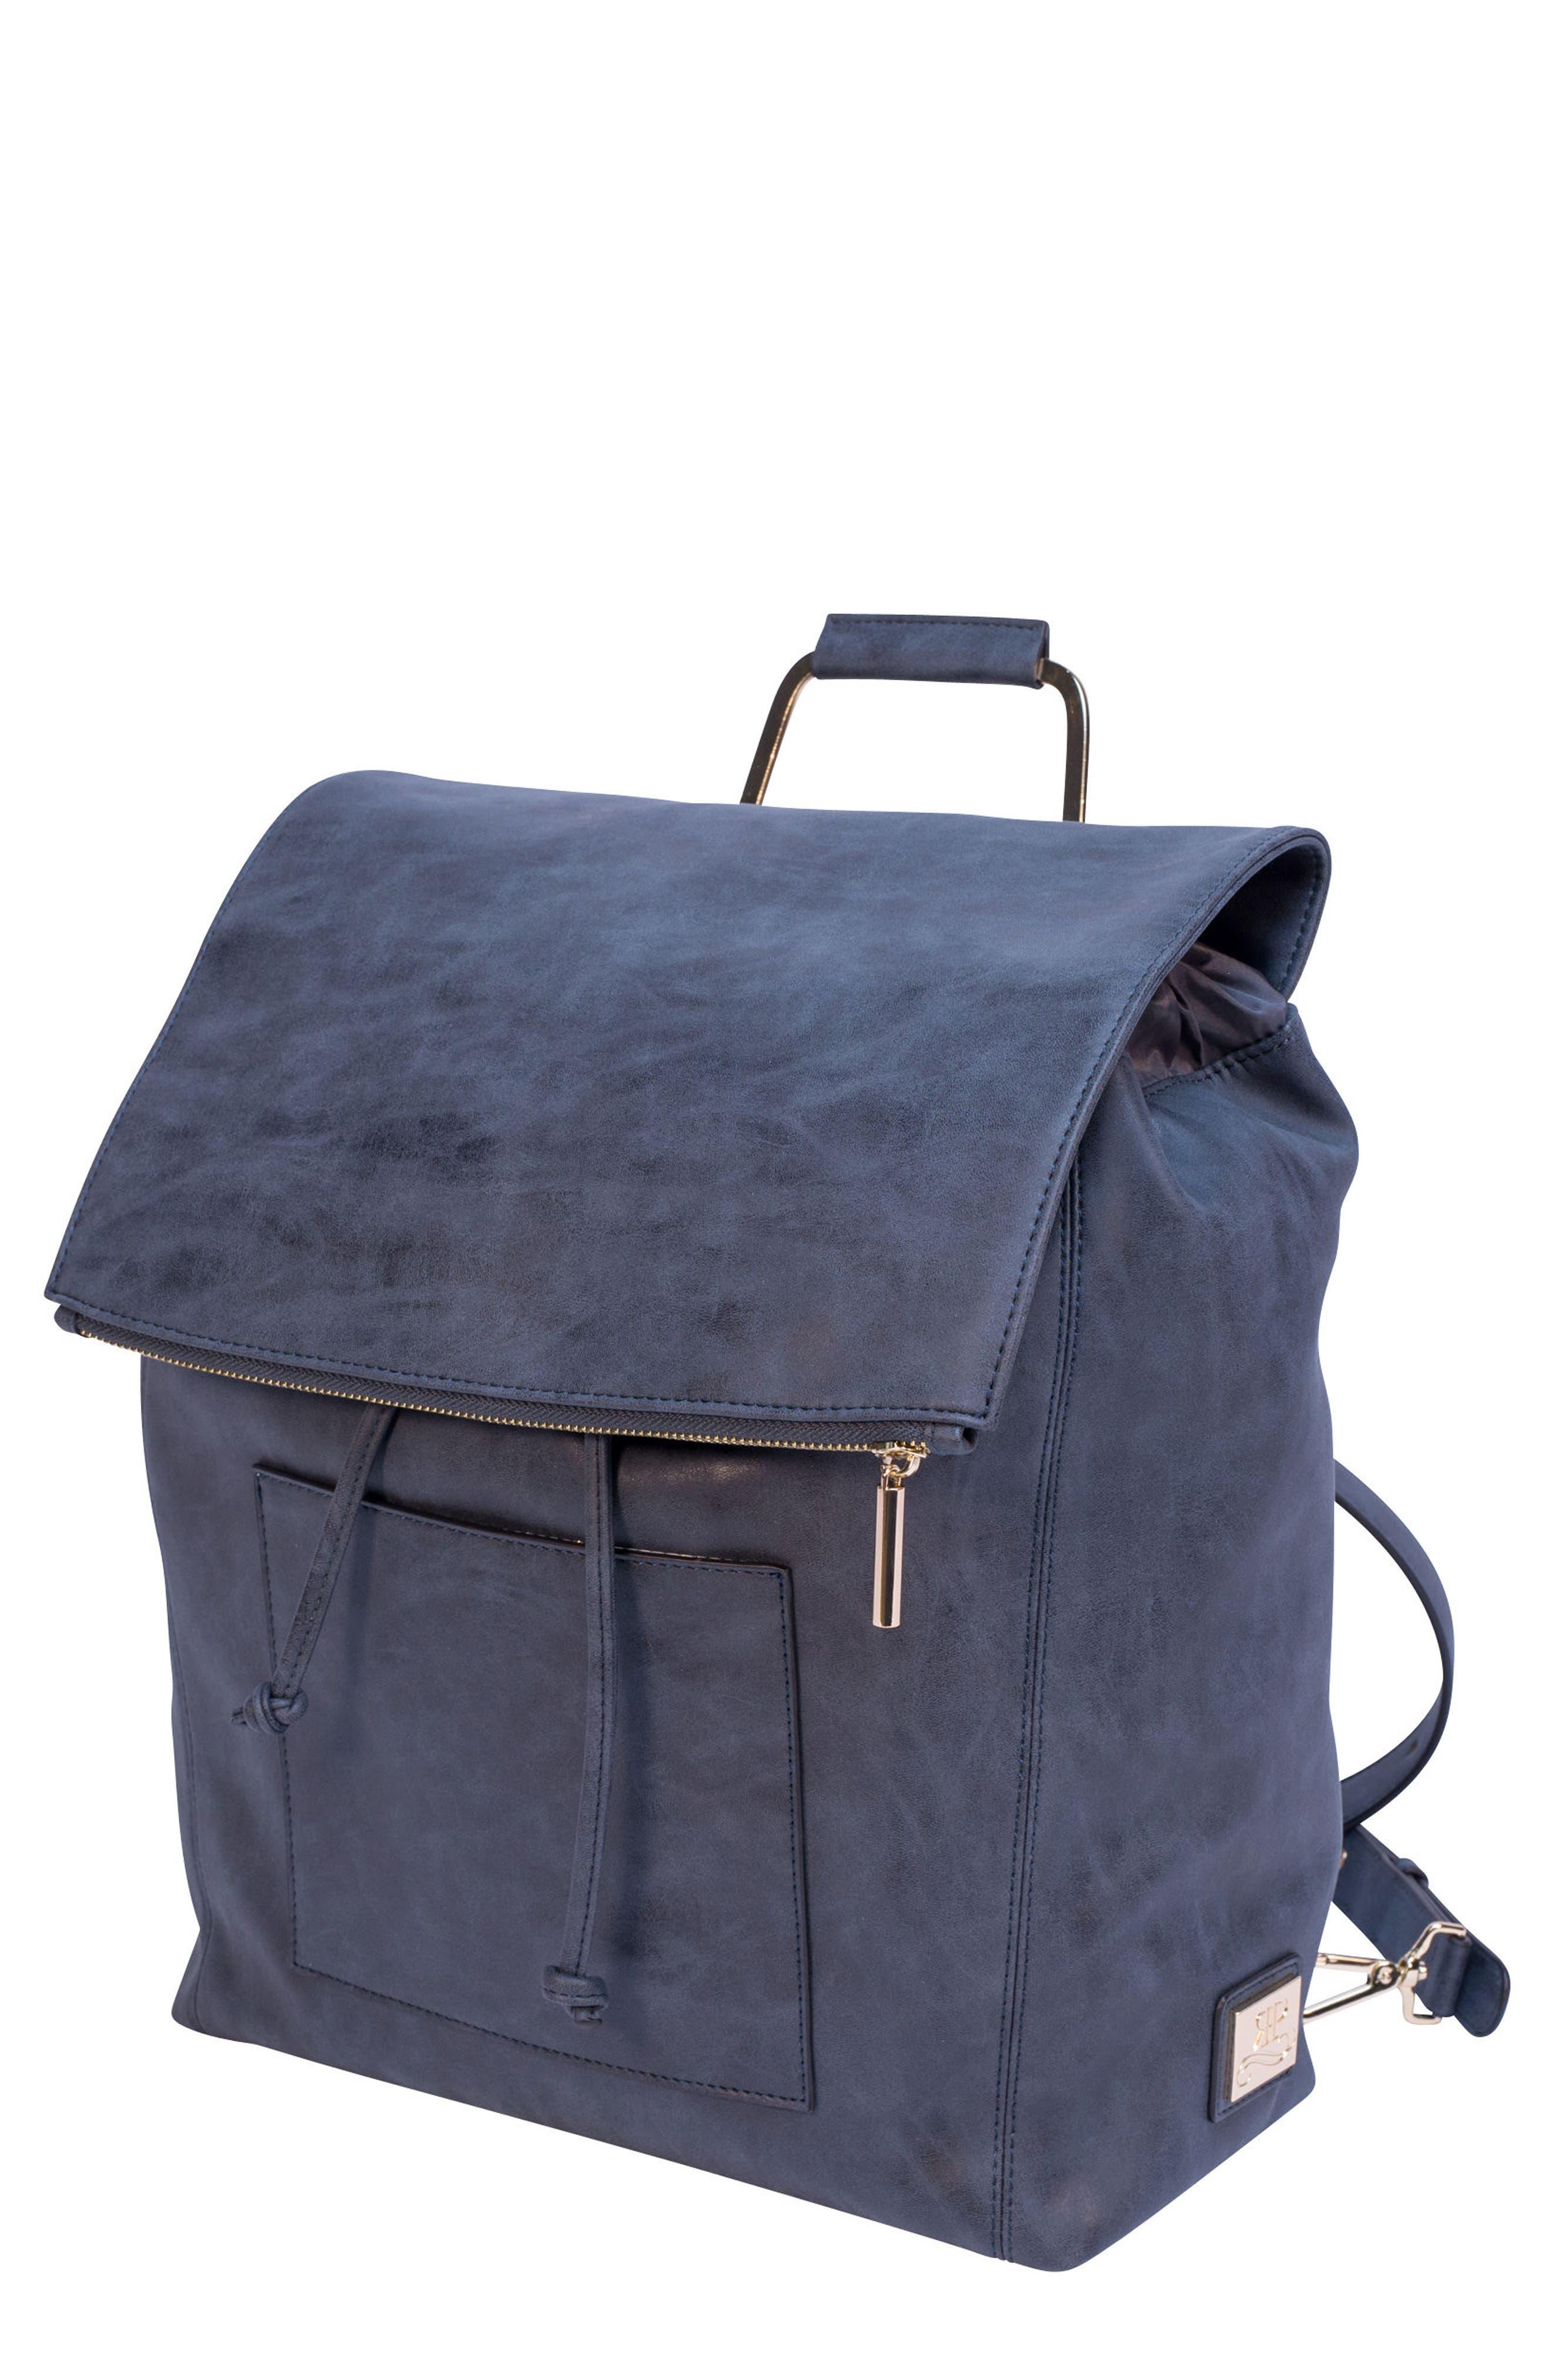 Highbury Hill Diaper Backpack,                             Main thumbnail 1, color,                             DUSTY NAVY